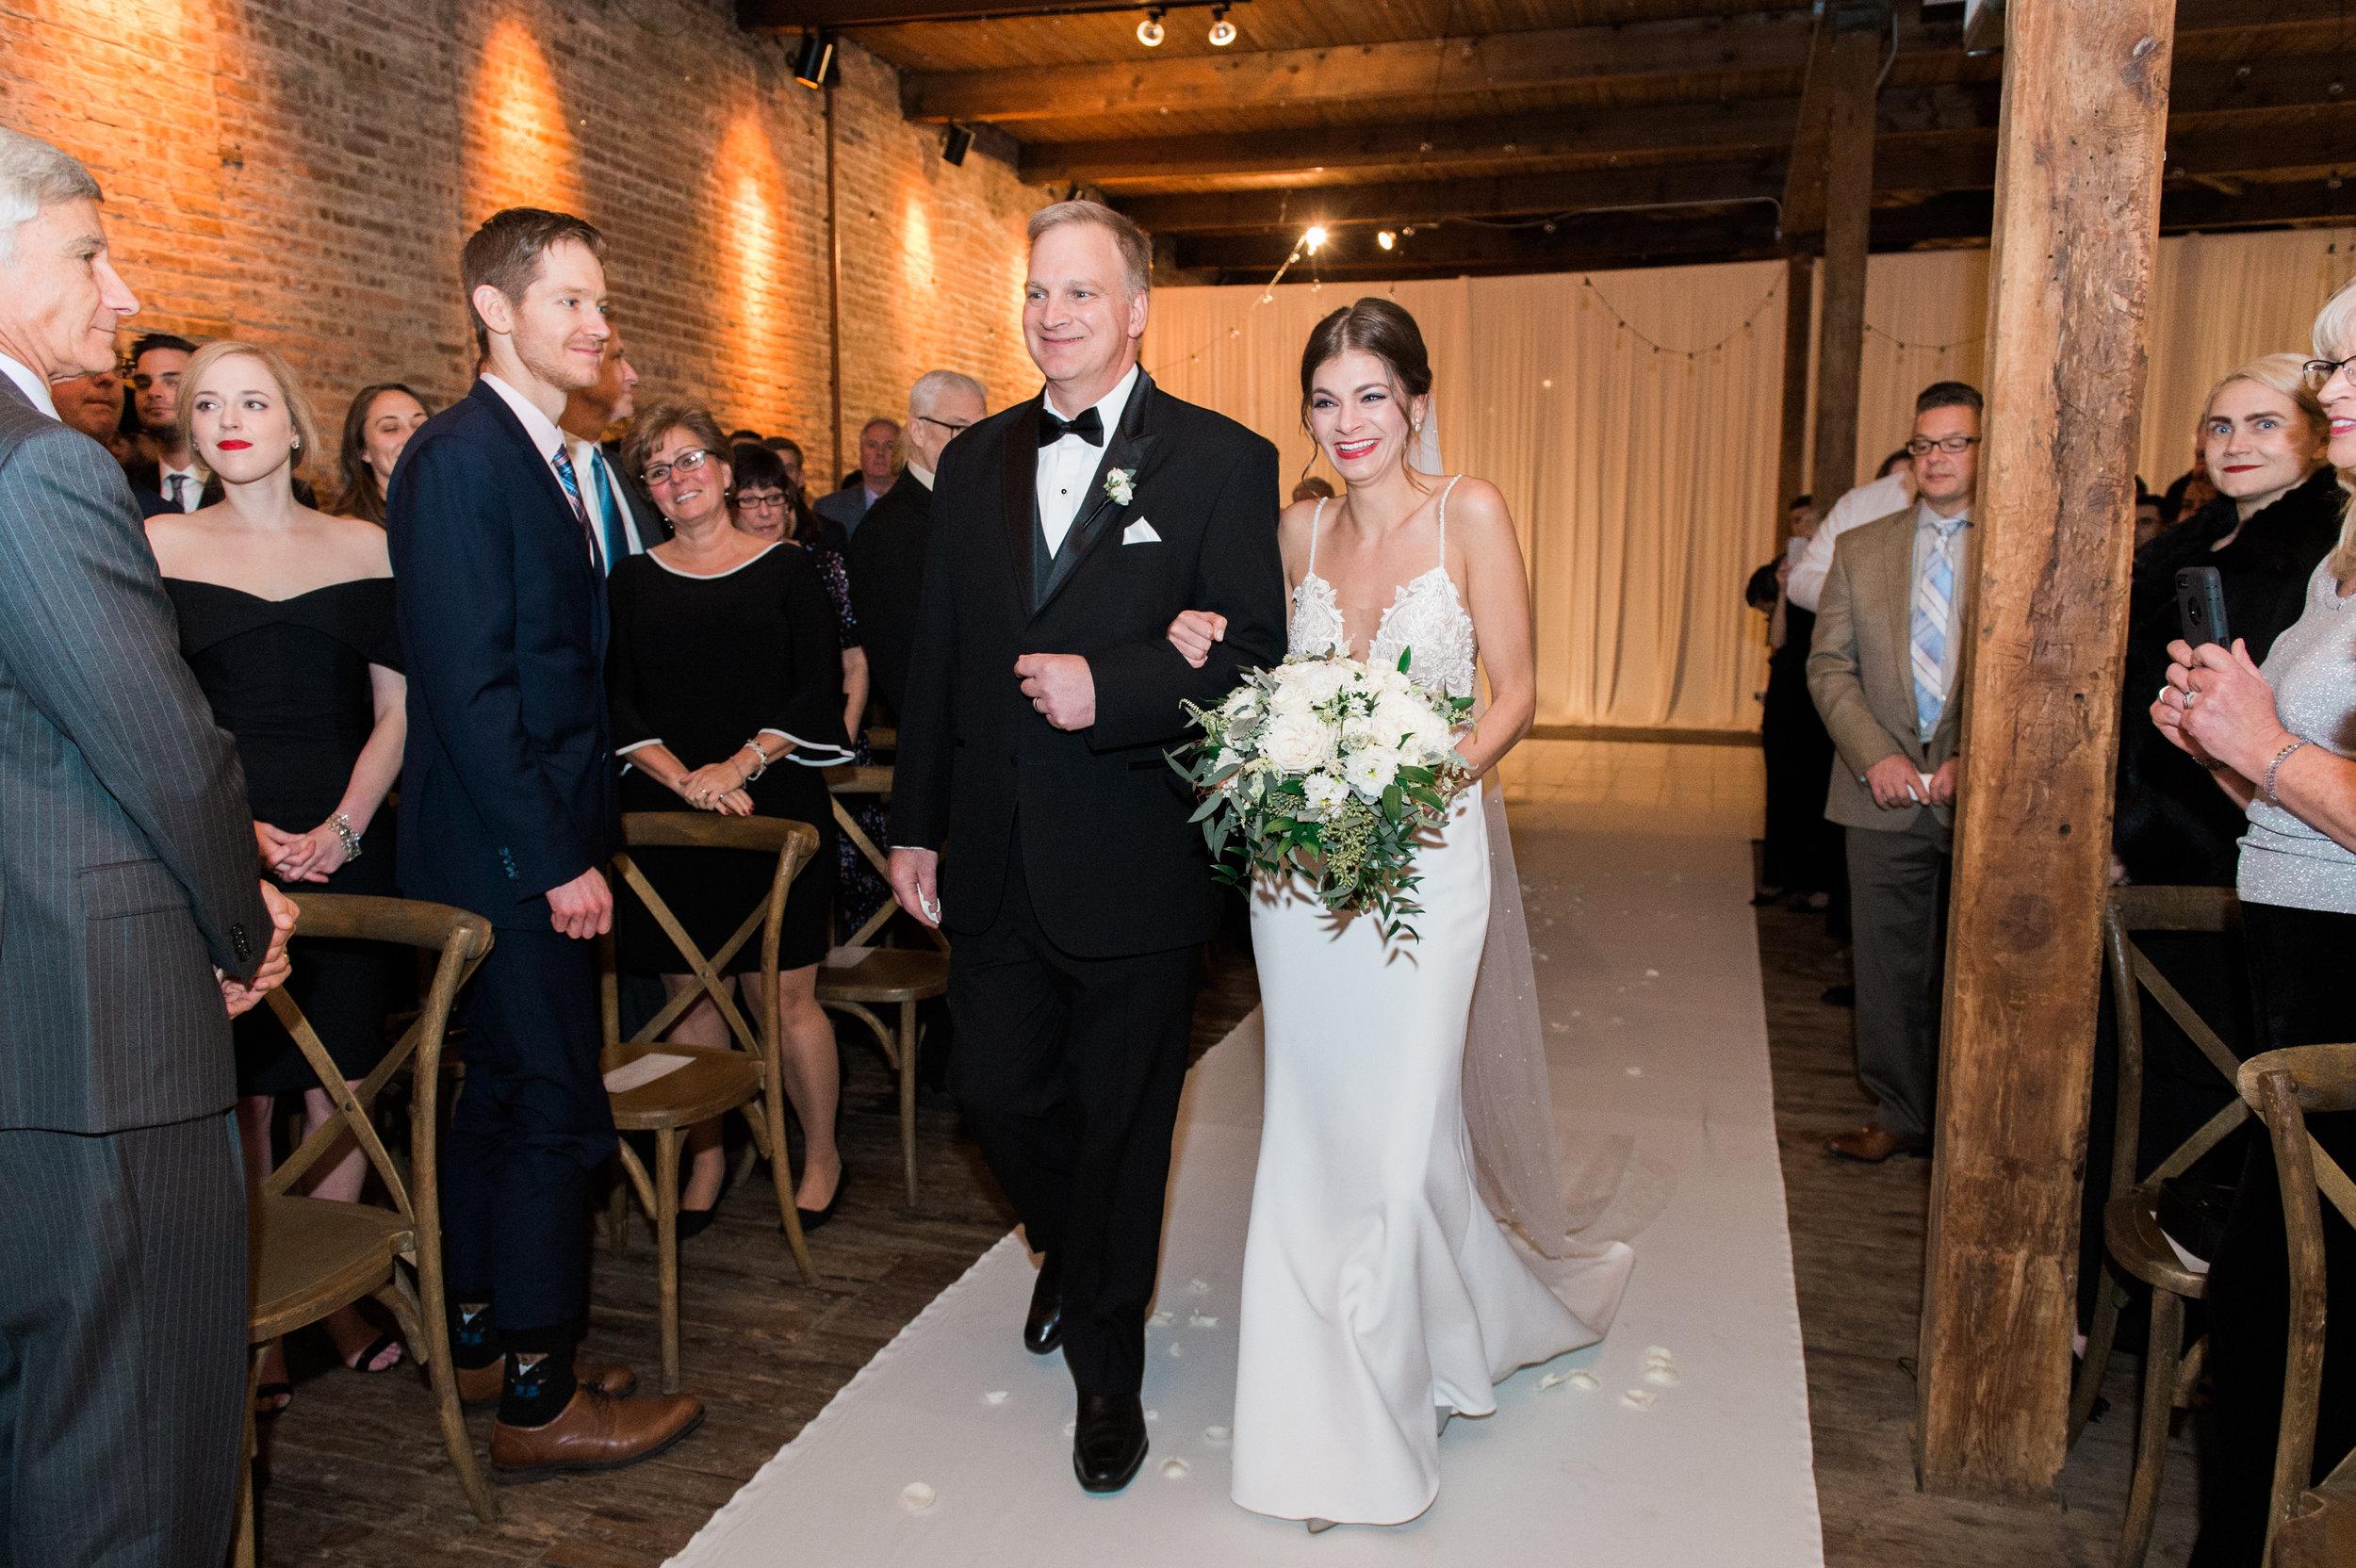 Bonphotage Chicago Fine Art Wedding Photography - Gallery 1028